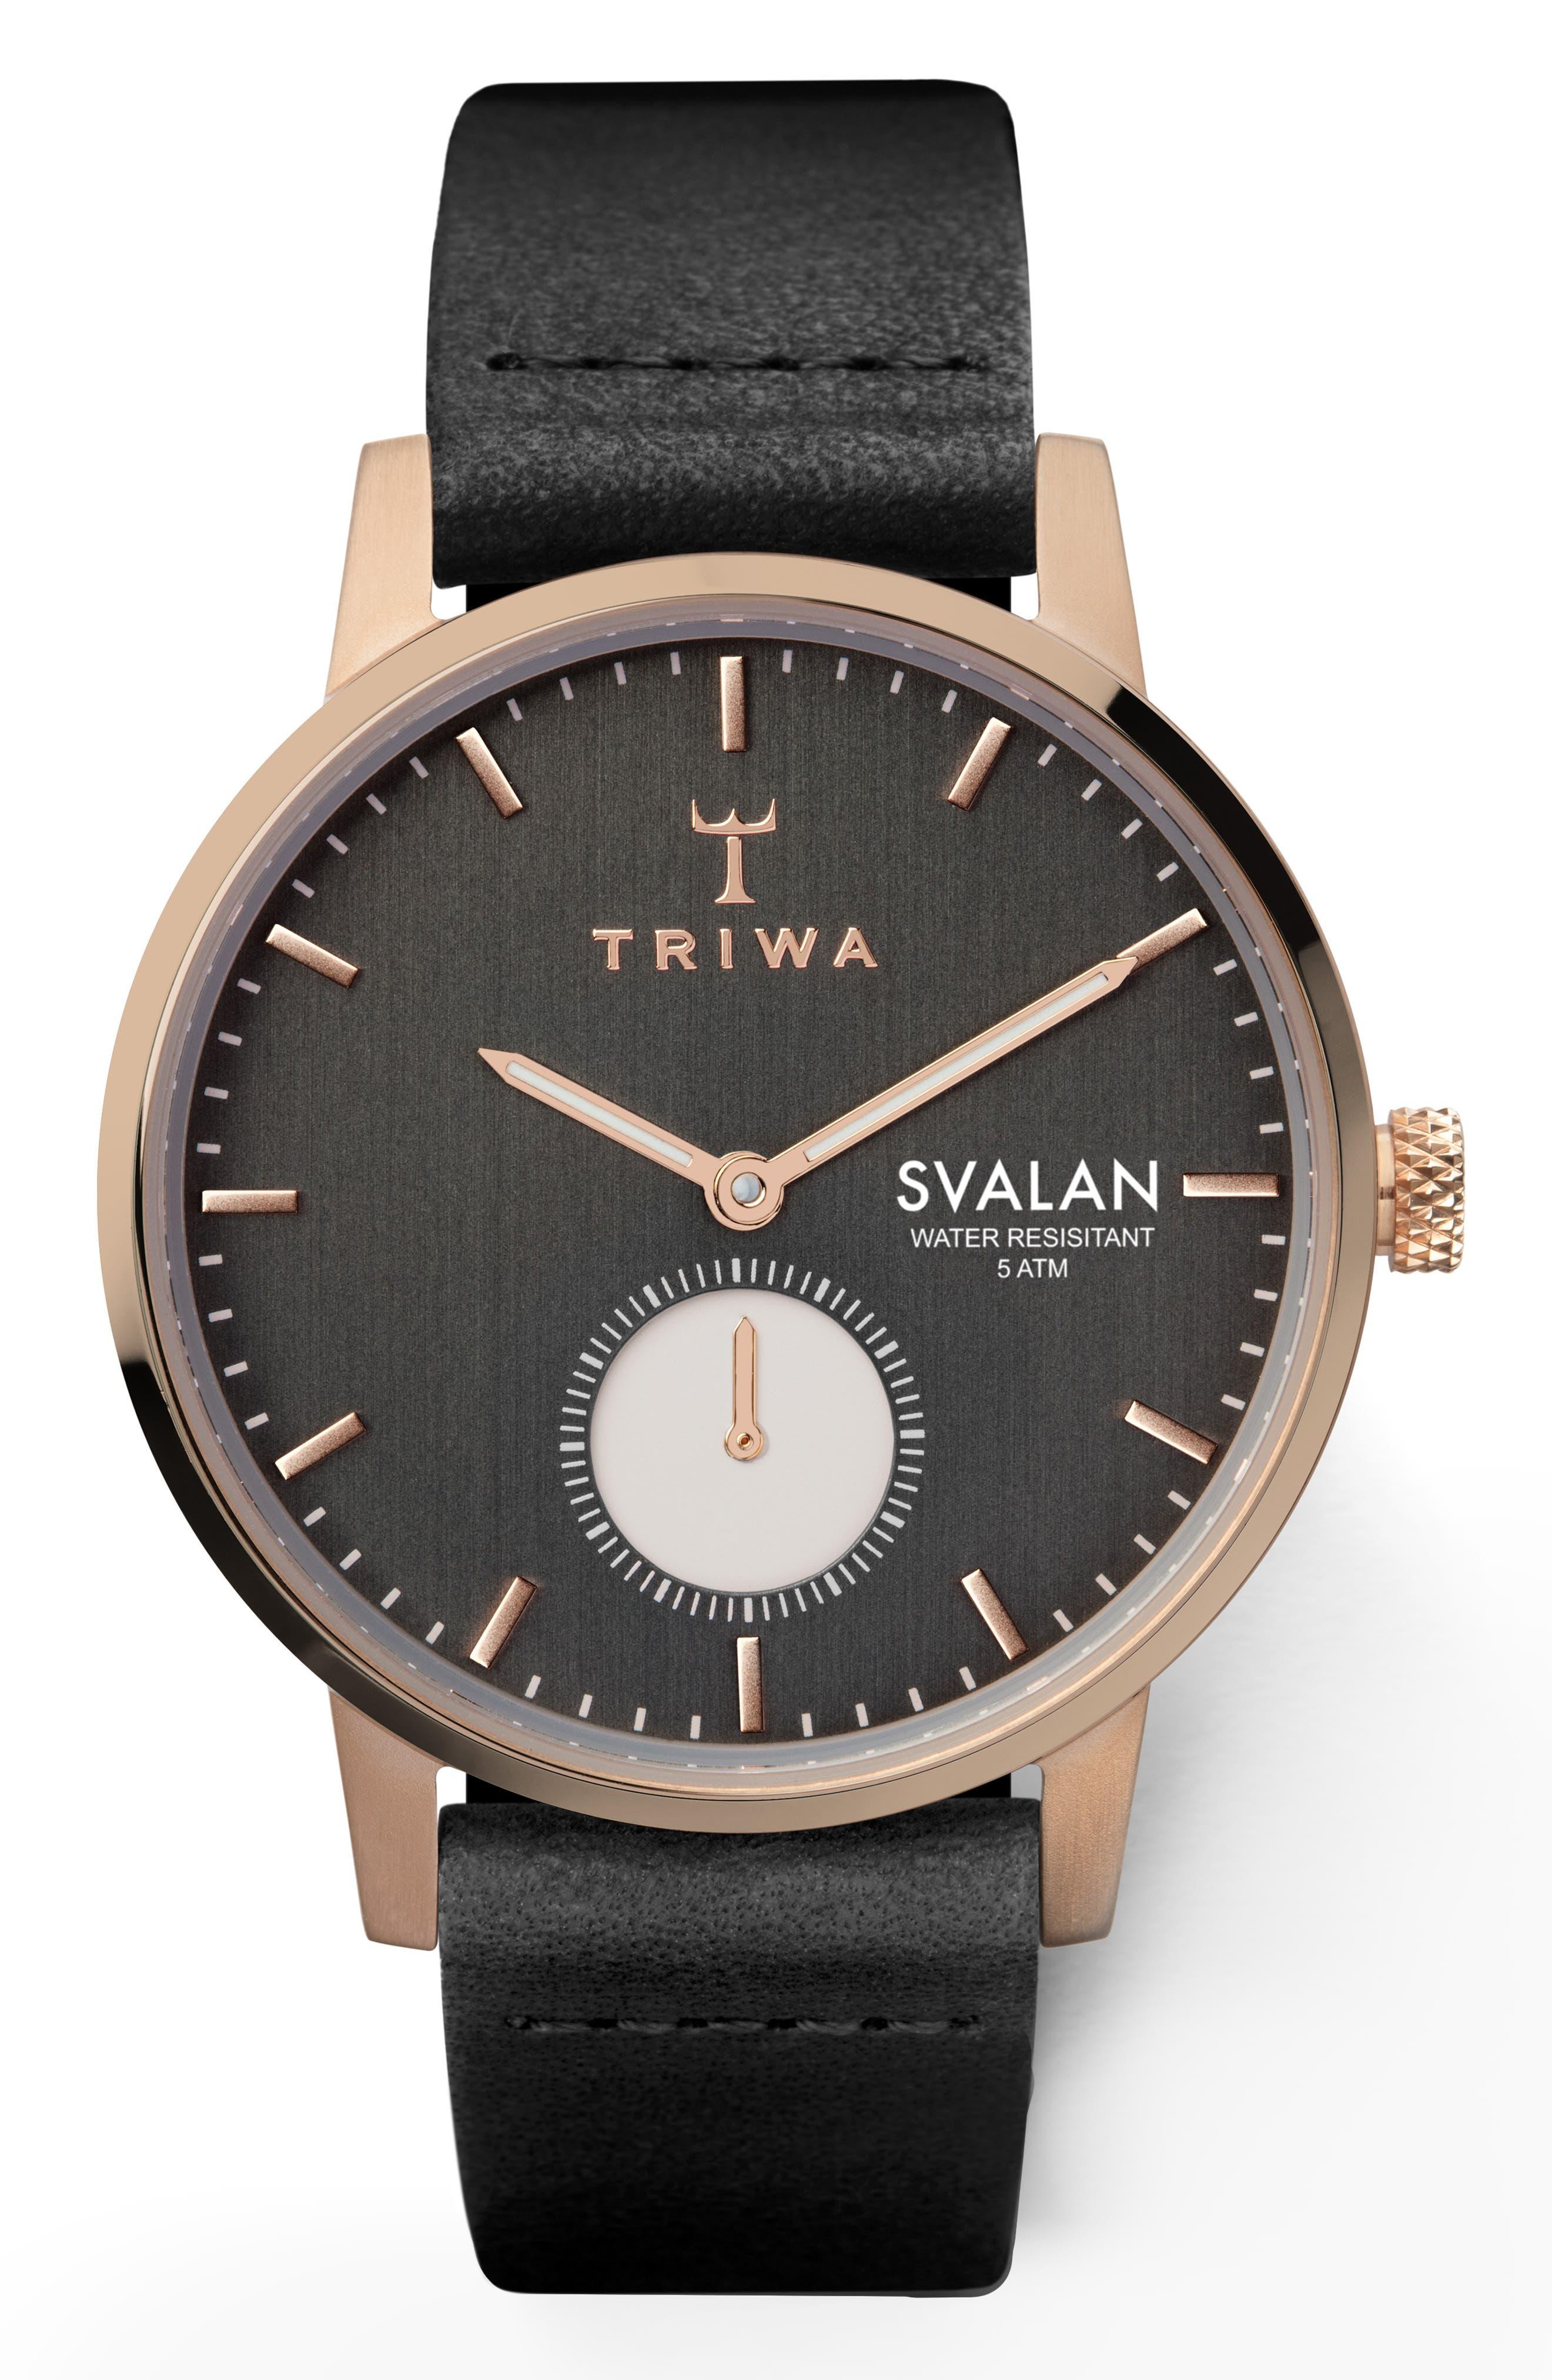 TRIWA Noir Svalan Leather Strap Watch, 34Mm in Black/ Rose Gold